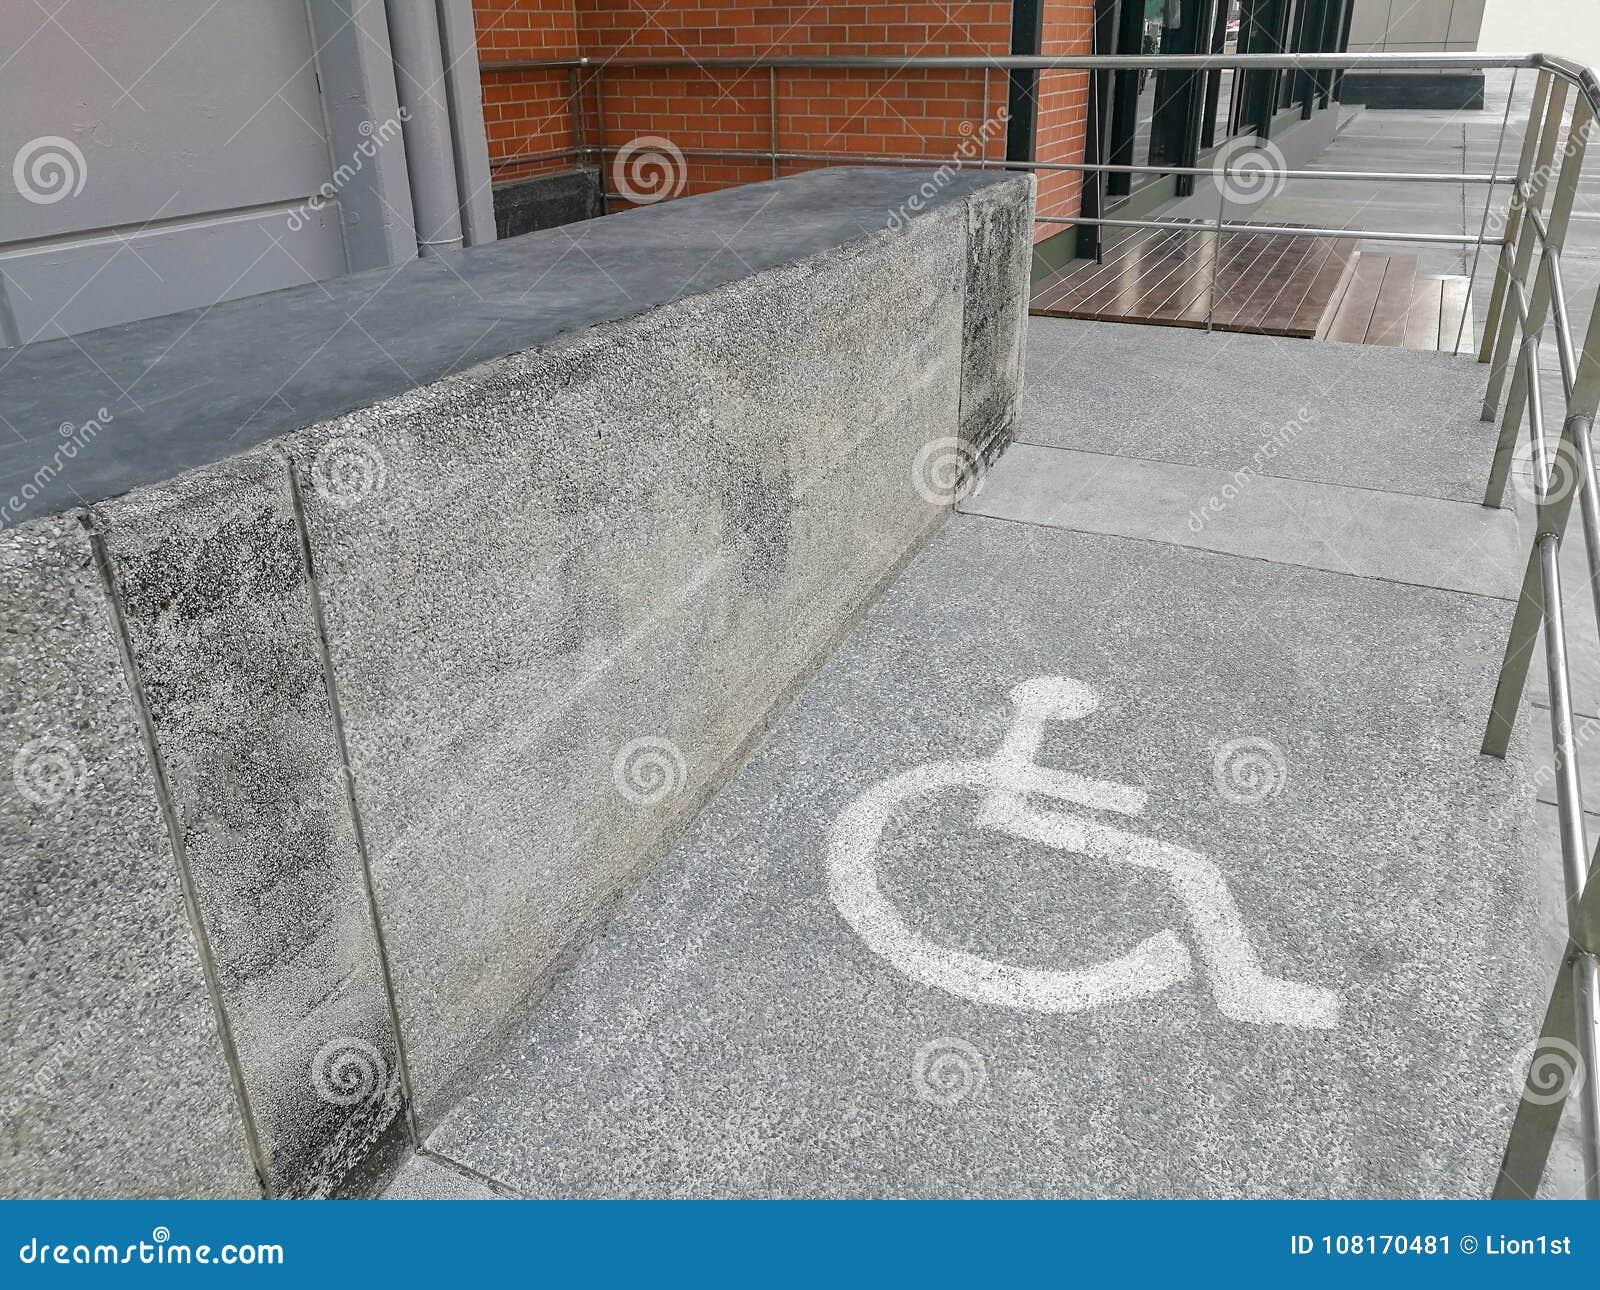 wheelchair ramp way stock image image of city stair 108170481